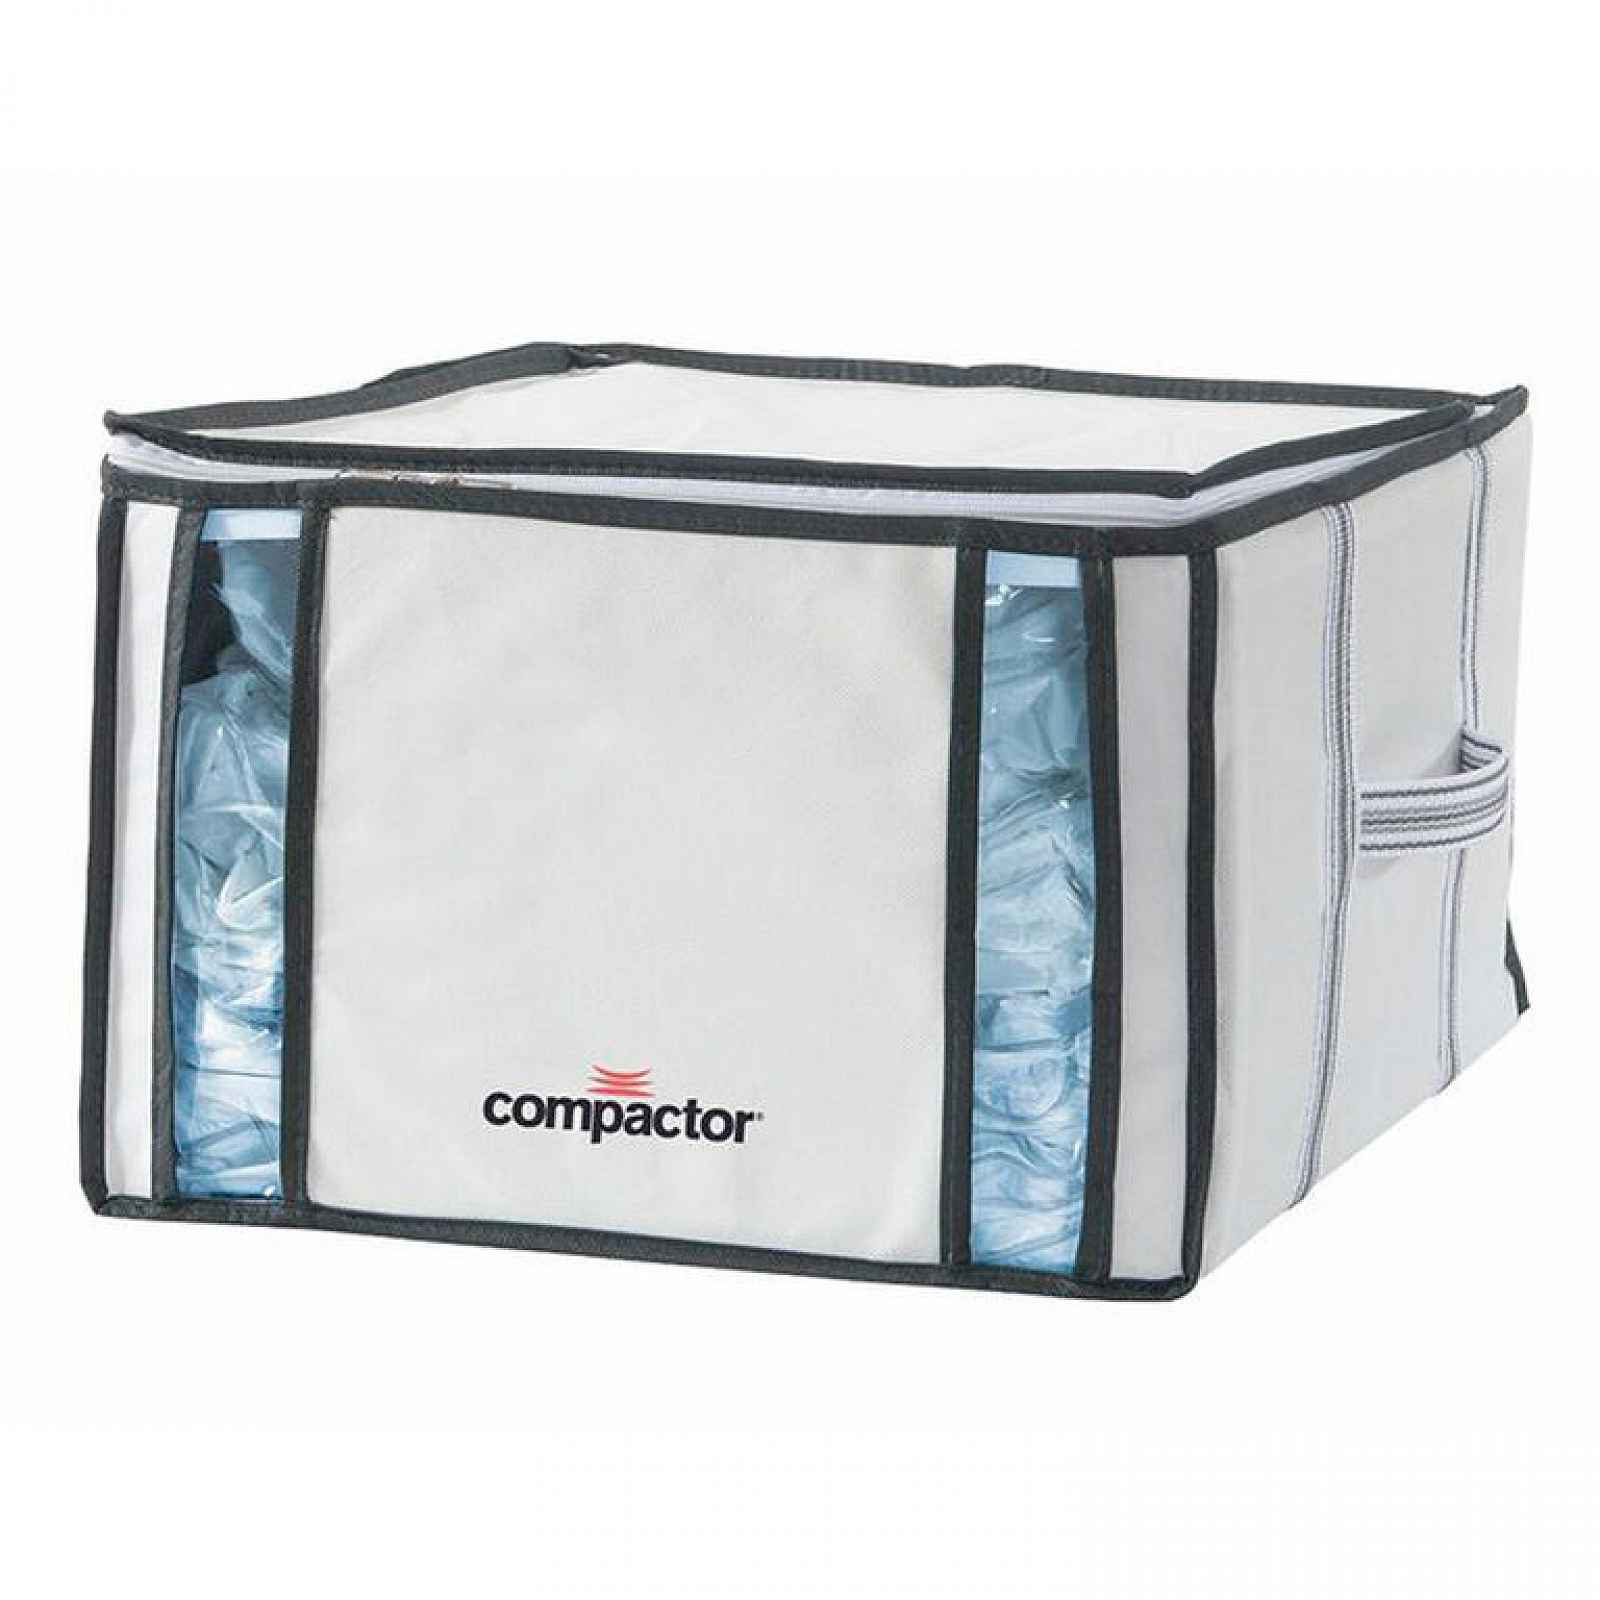 Compactor Life M 125 litrů úložný box s vakuovým sáčkem